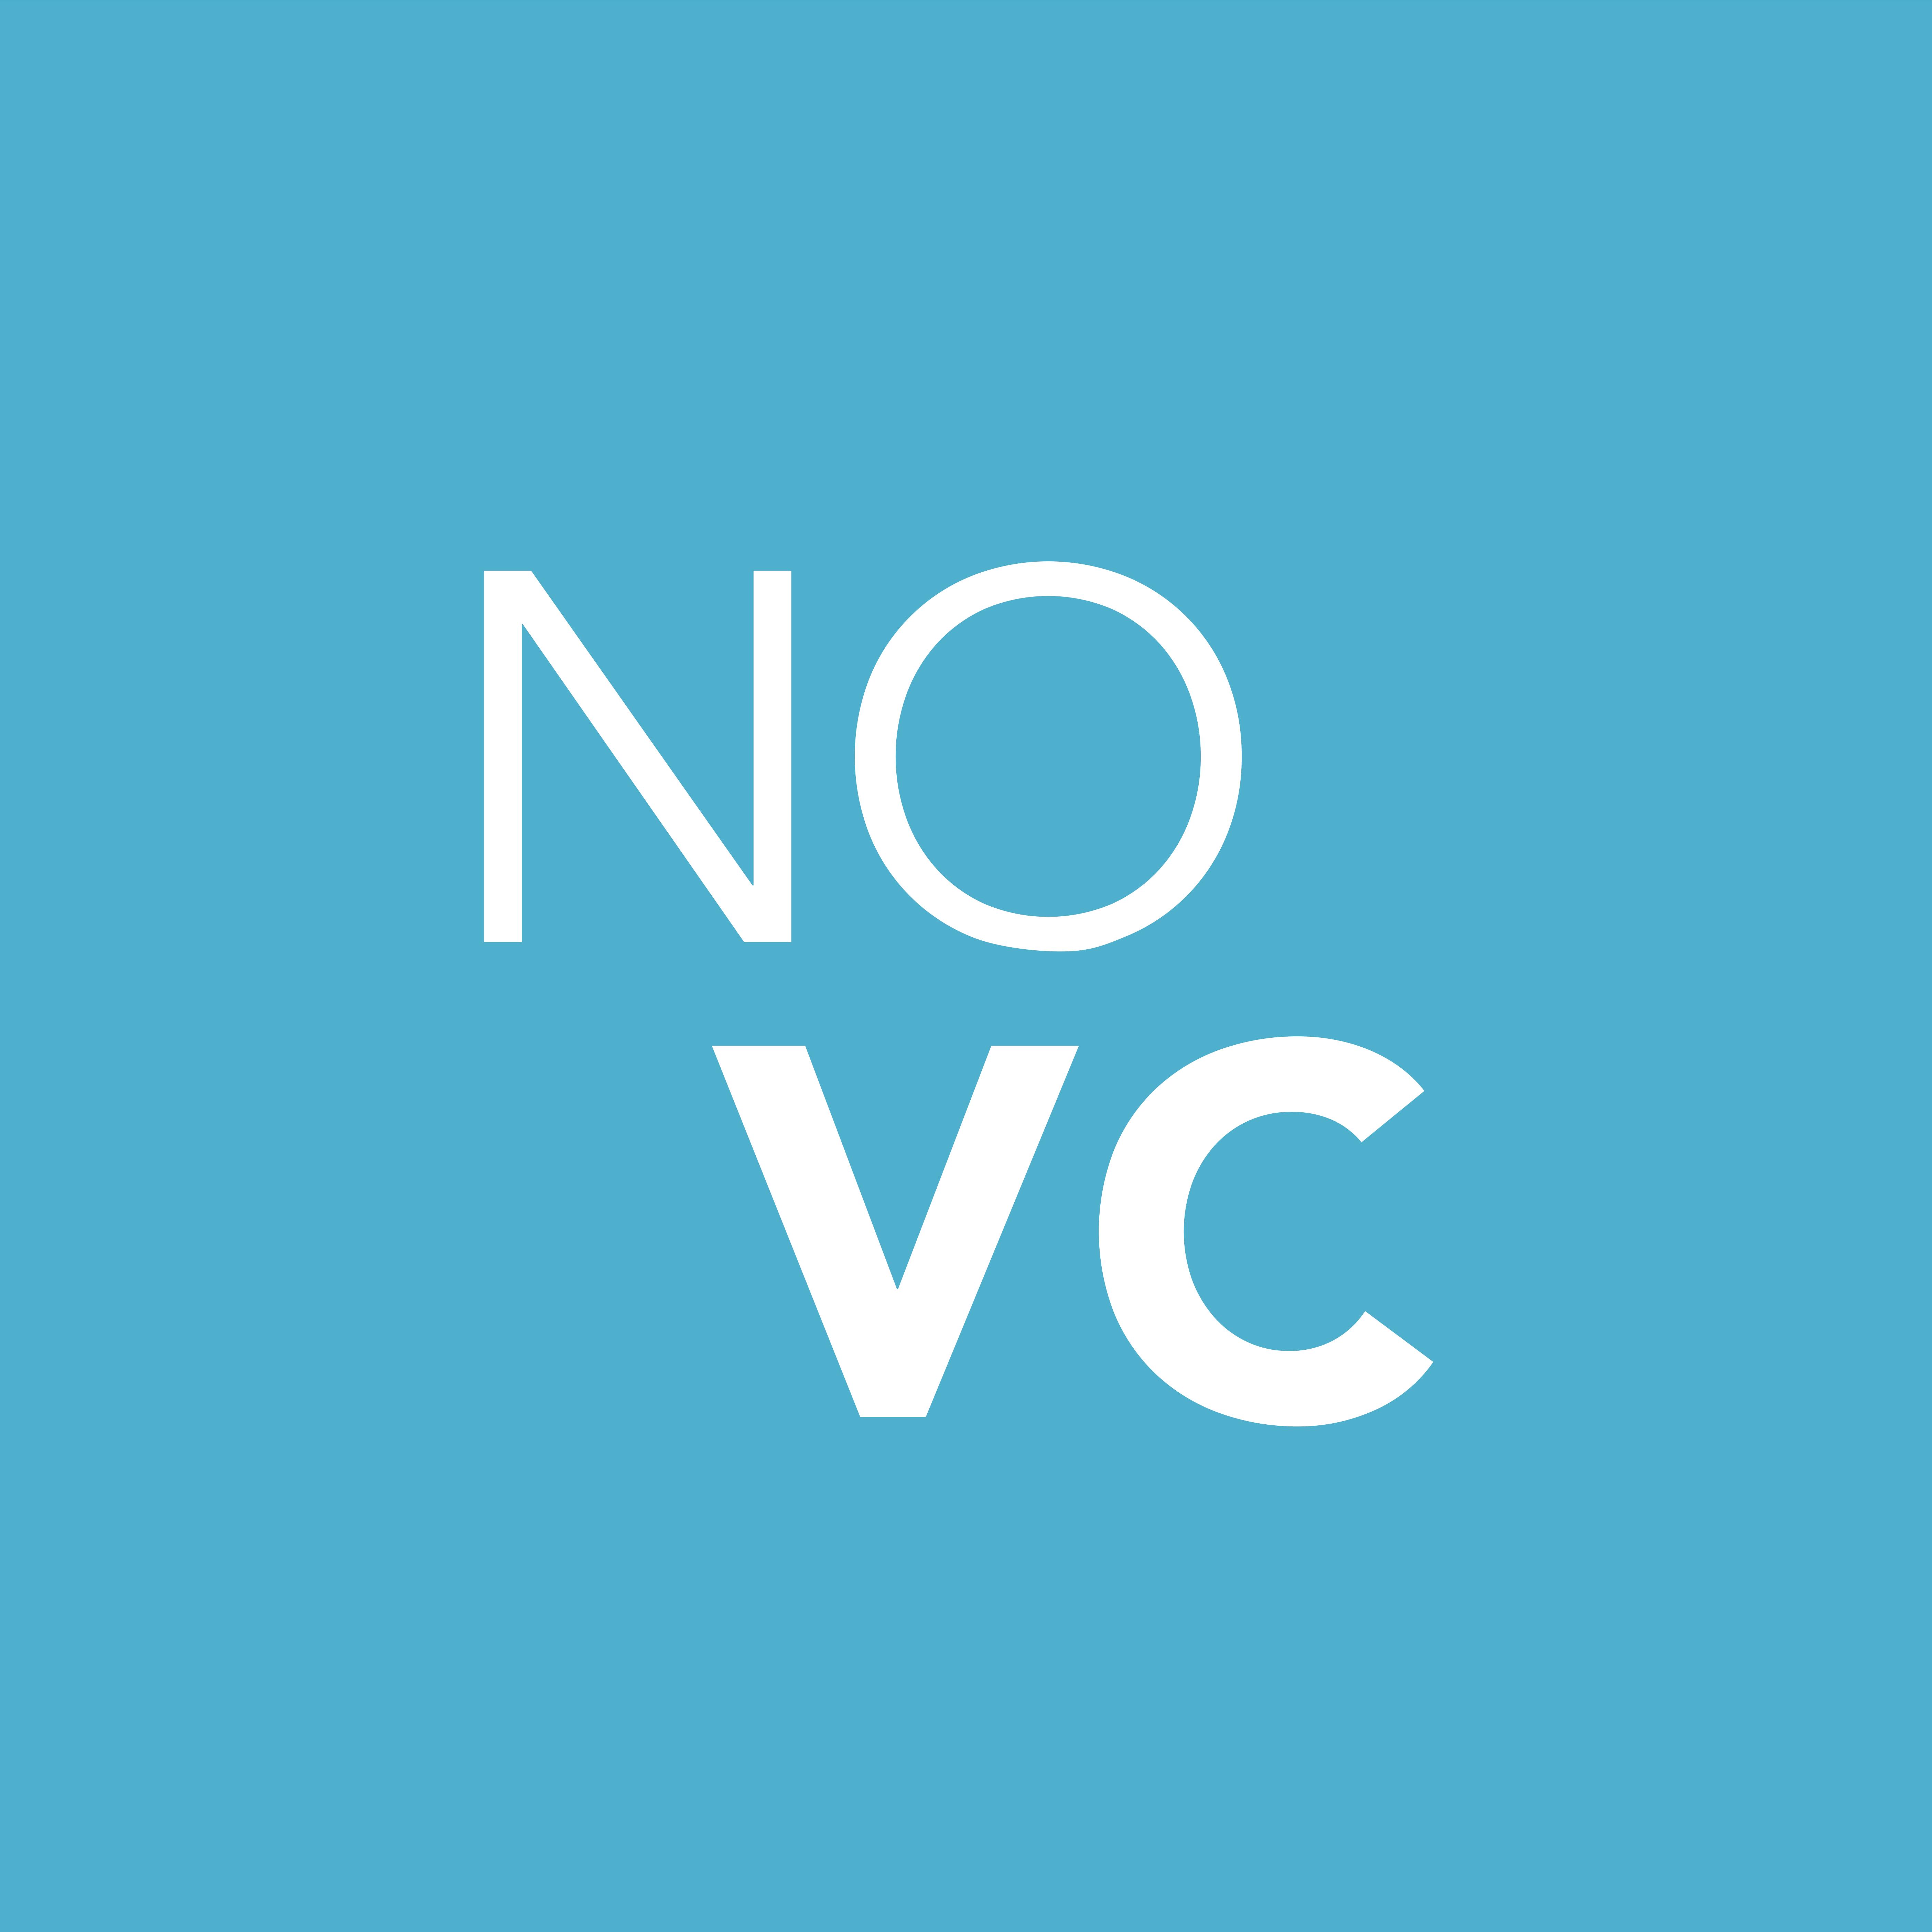 NOVC show art